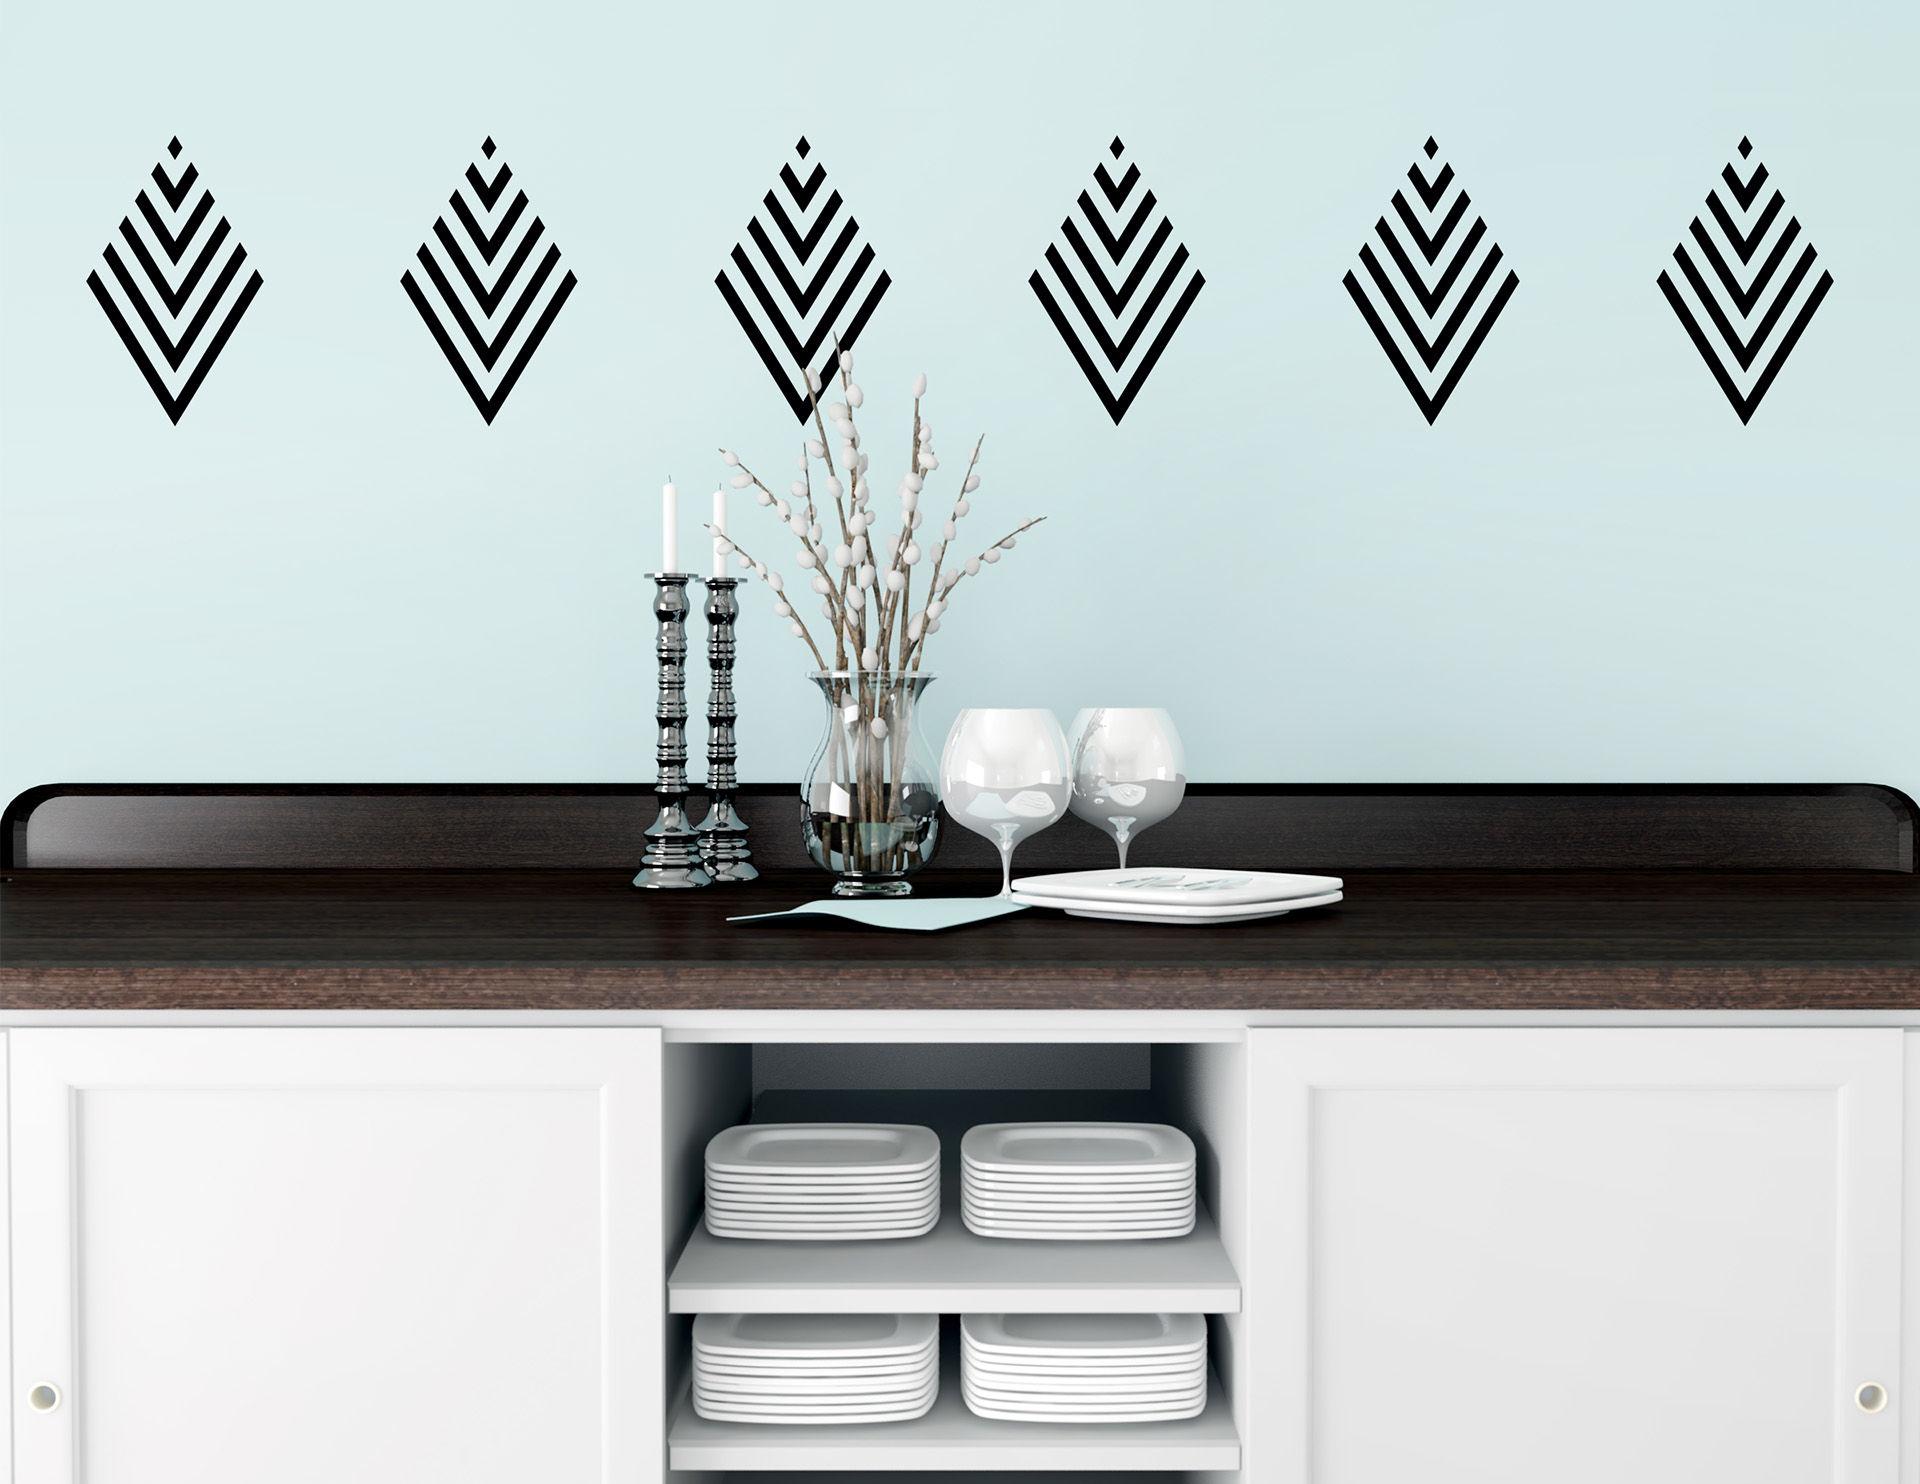 Art Nouveau - Rhomb, Wandtattoo-Set mit 6 schönen Elementen